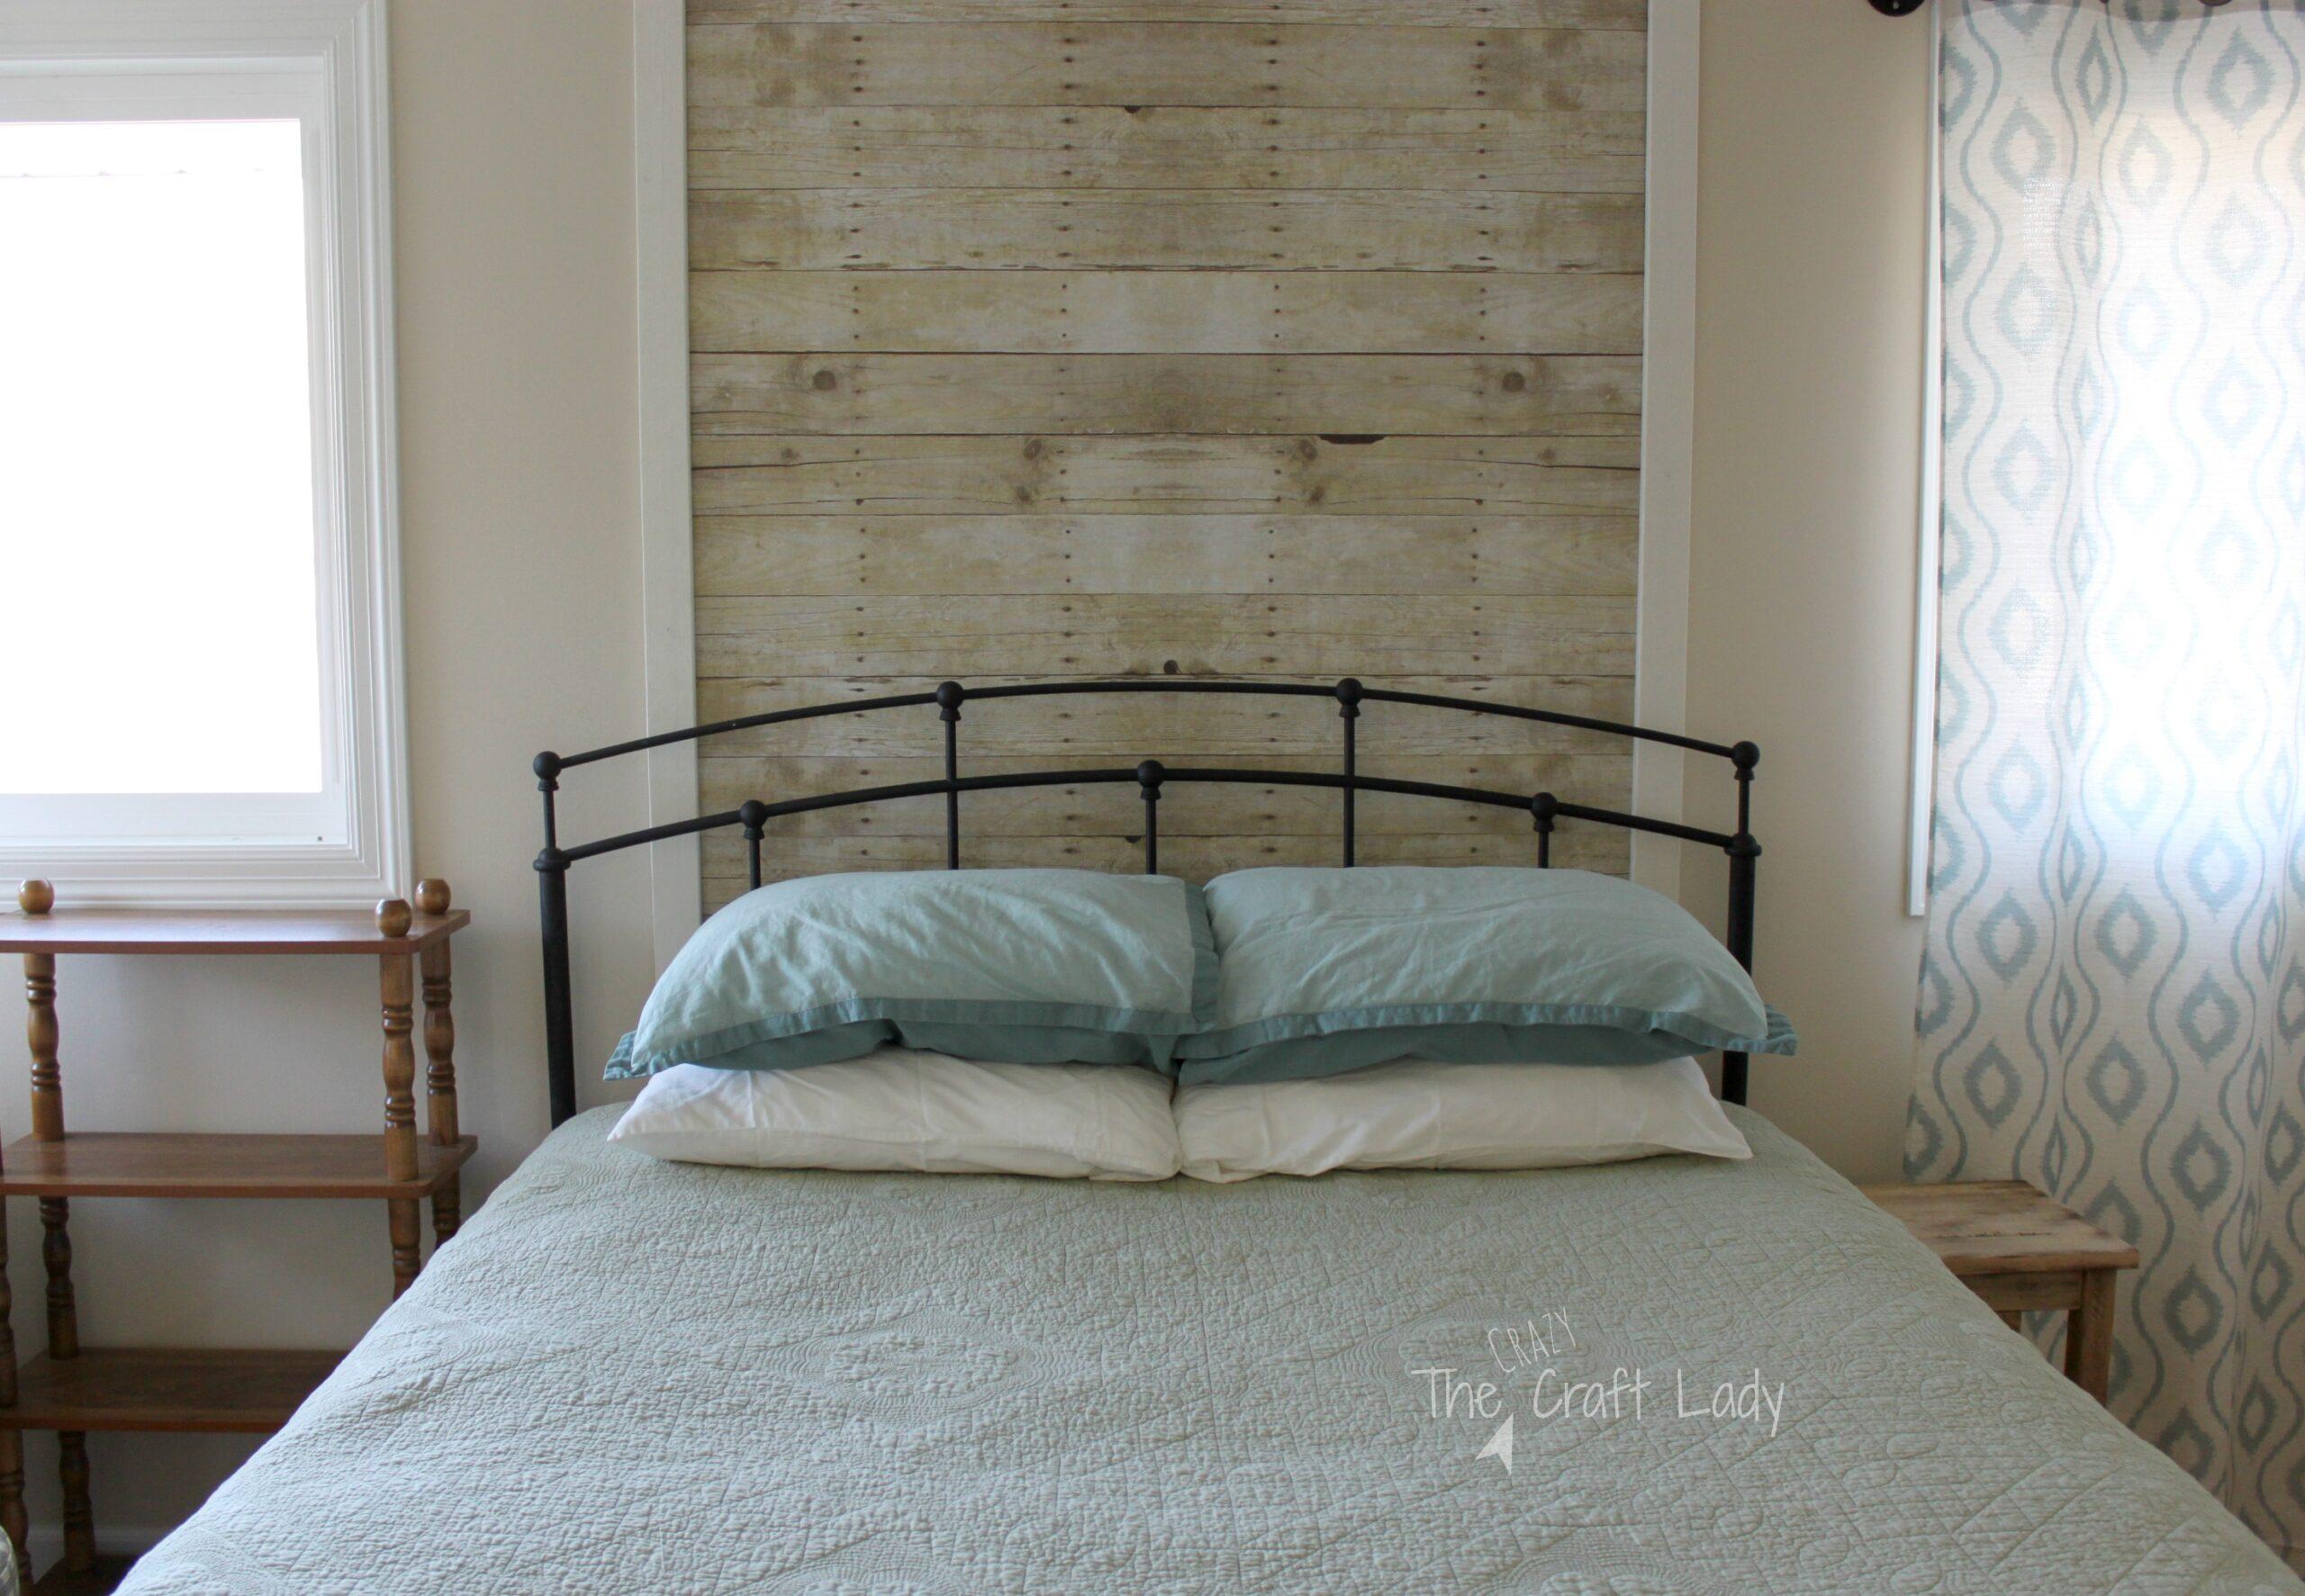 The One Room Challenge Week 4 - DIY wall decor